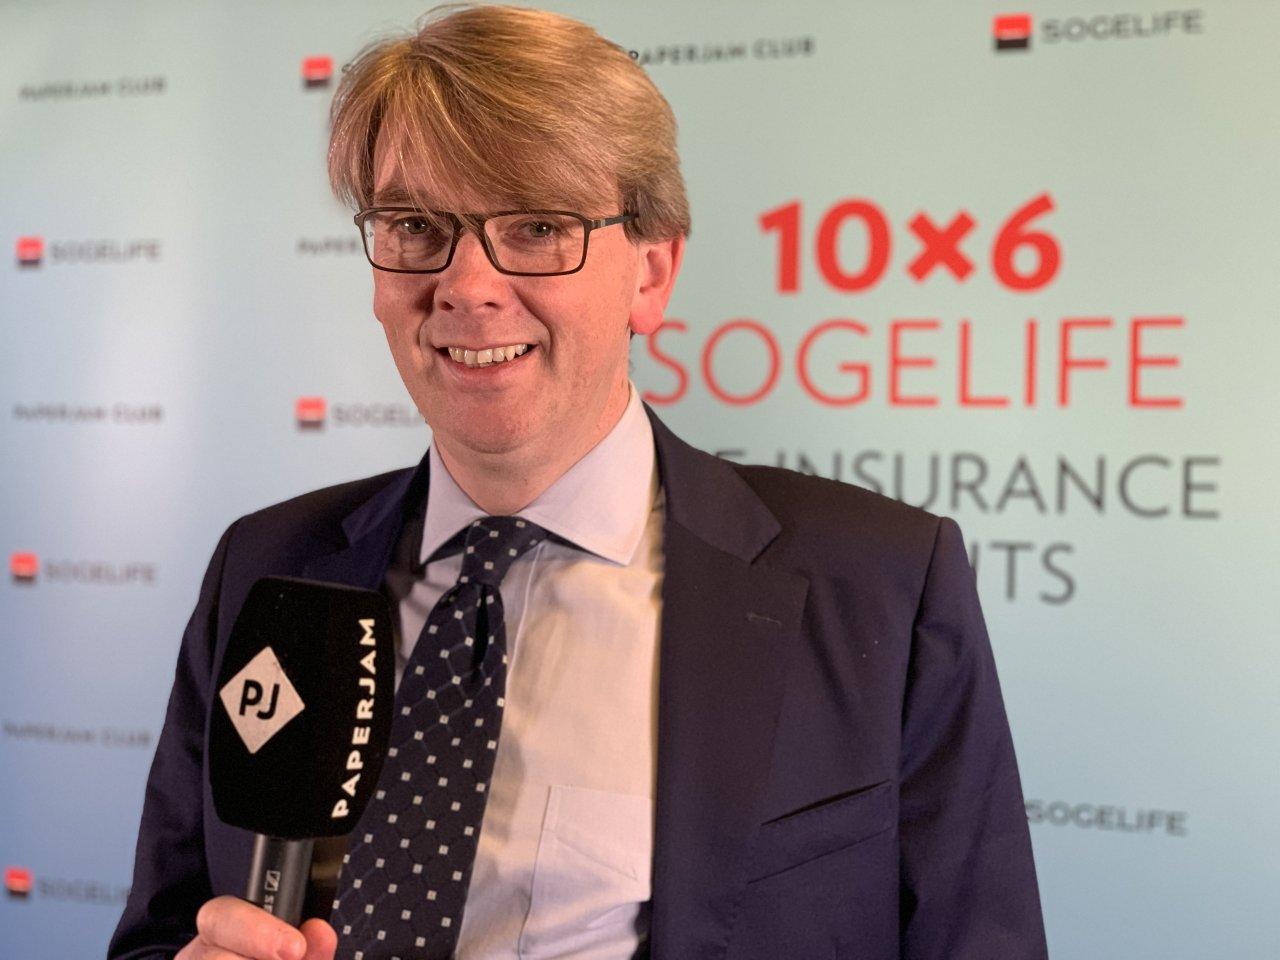 10x6 Sogelife: Life insurance insights -3x plus claire - Matt Moran - PwC